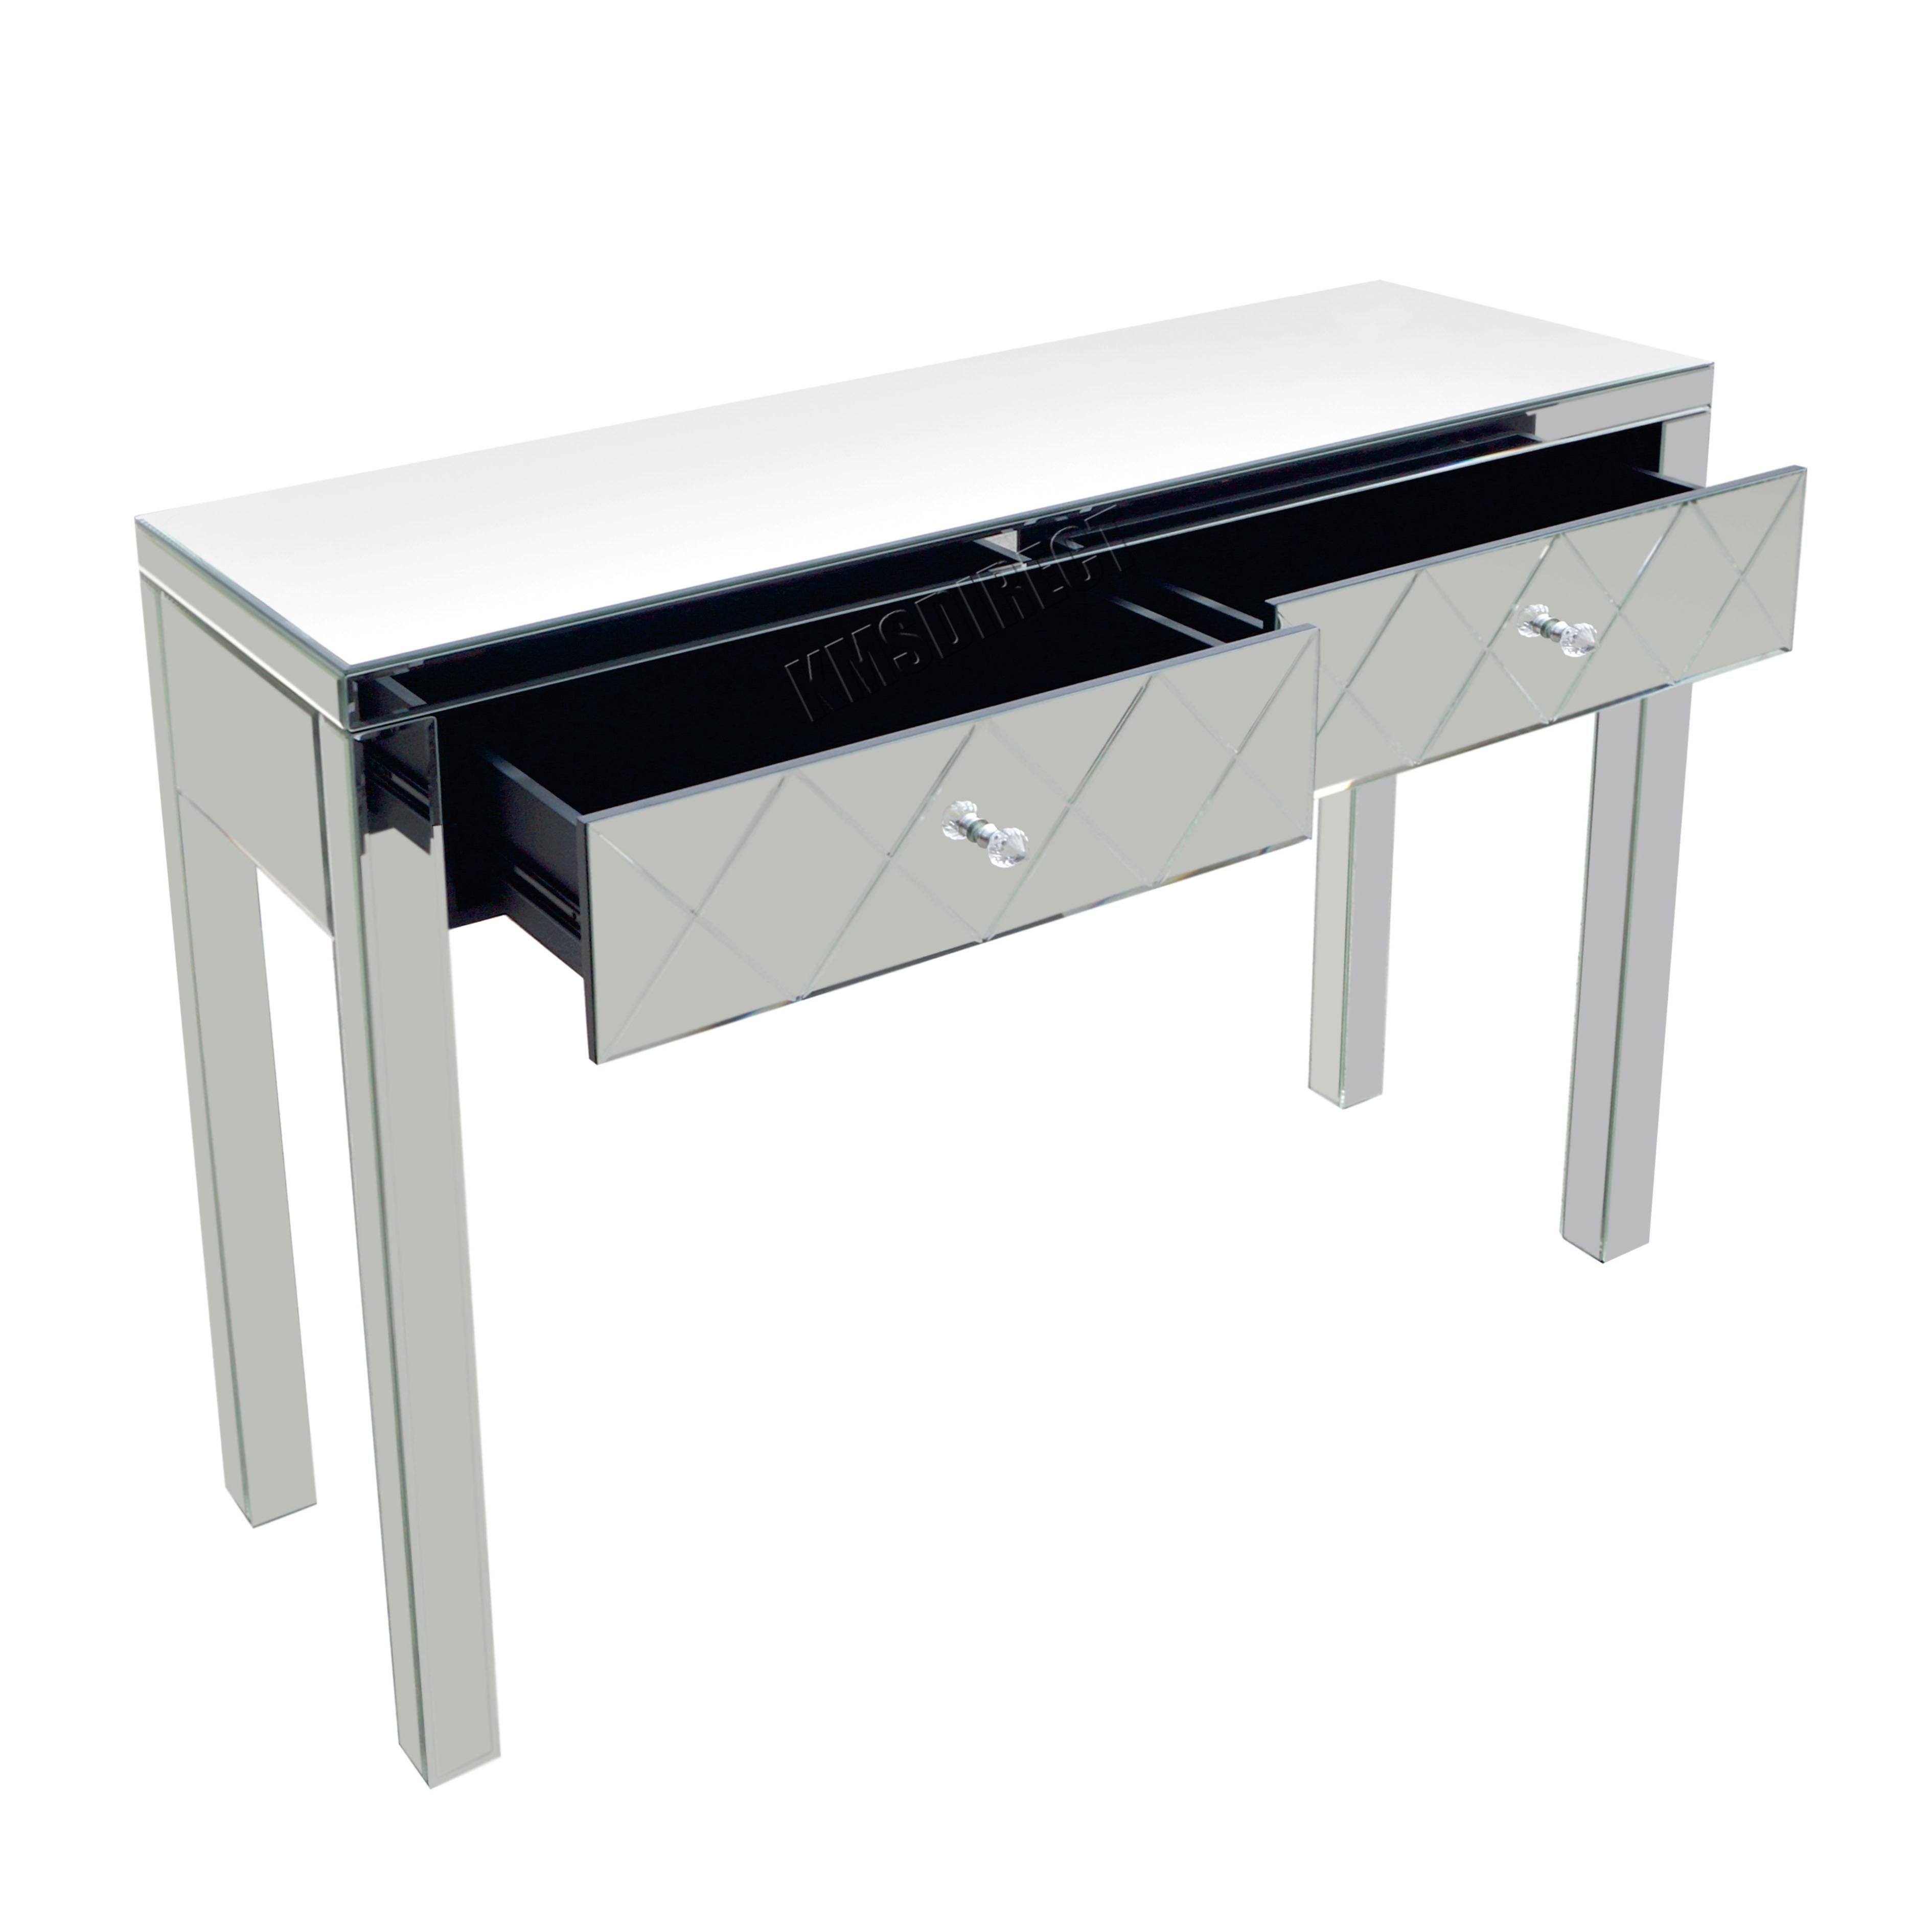 Foxhunter mirrored furniture glass dressing table with for Home furniture dressing table